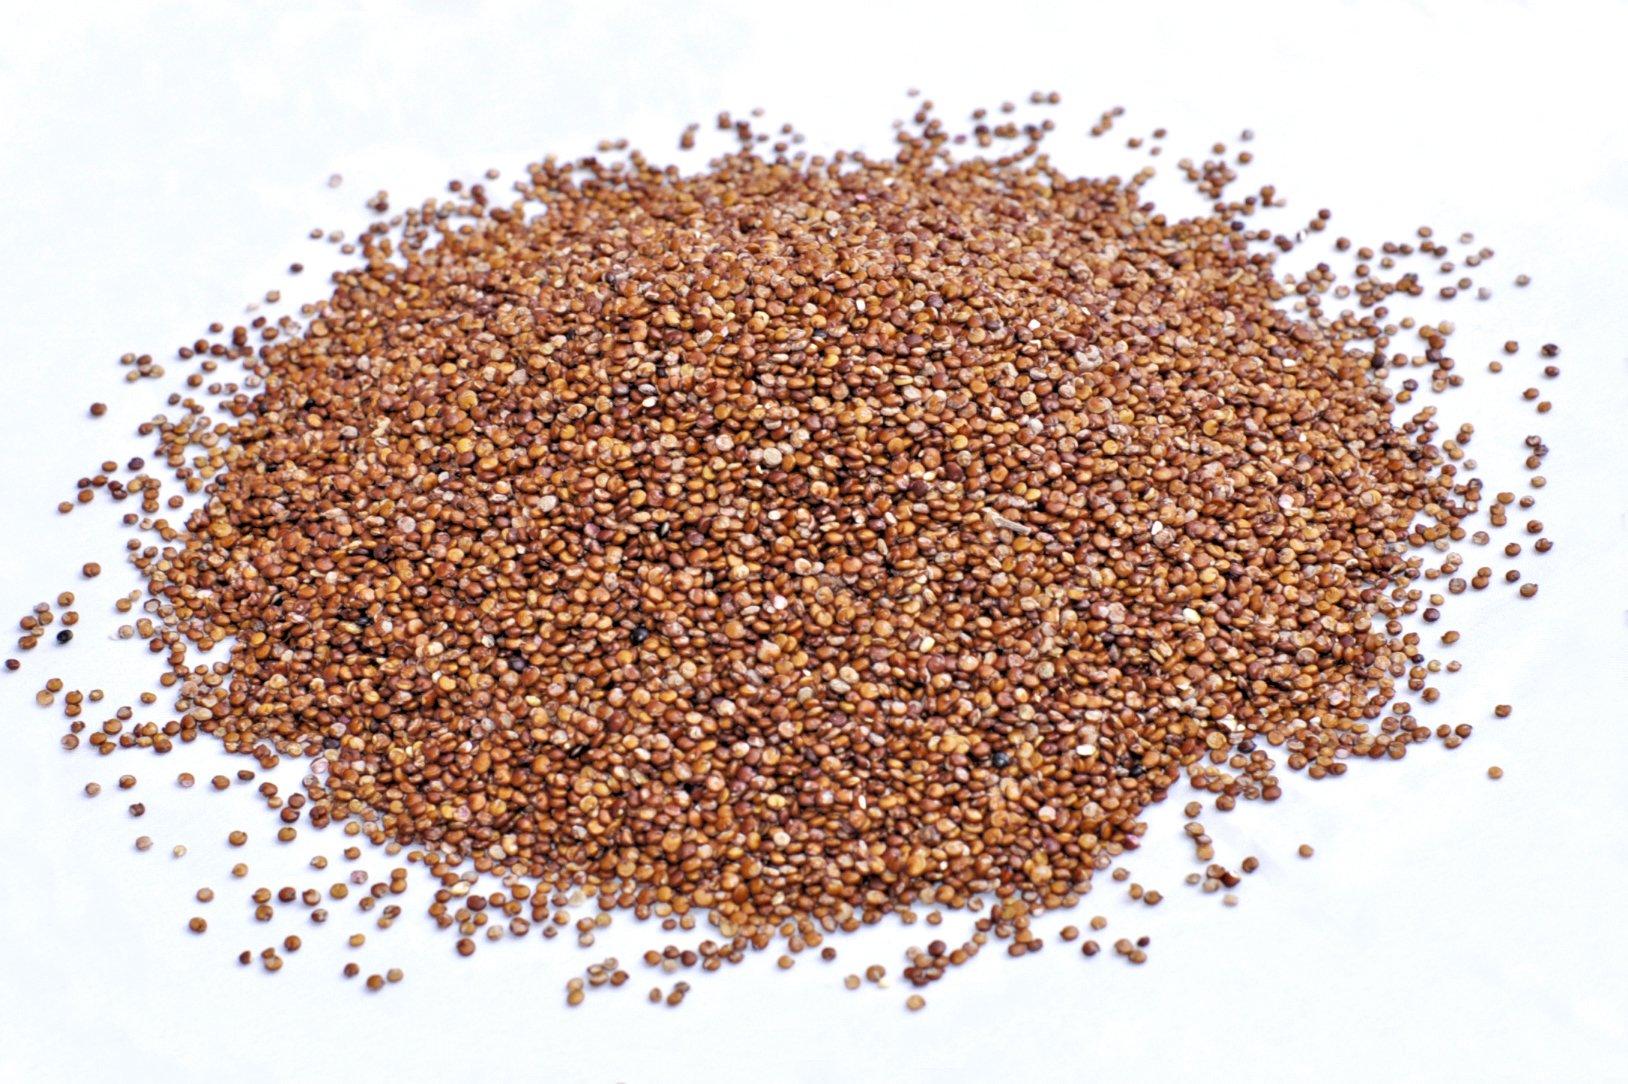 Royal Organic Red OA Quinoa (25 Lb bag) by OA QUINOA (Image #4)